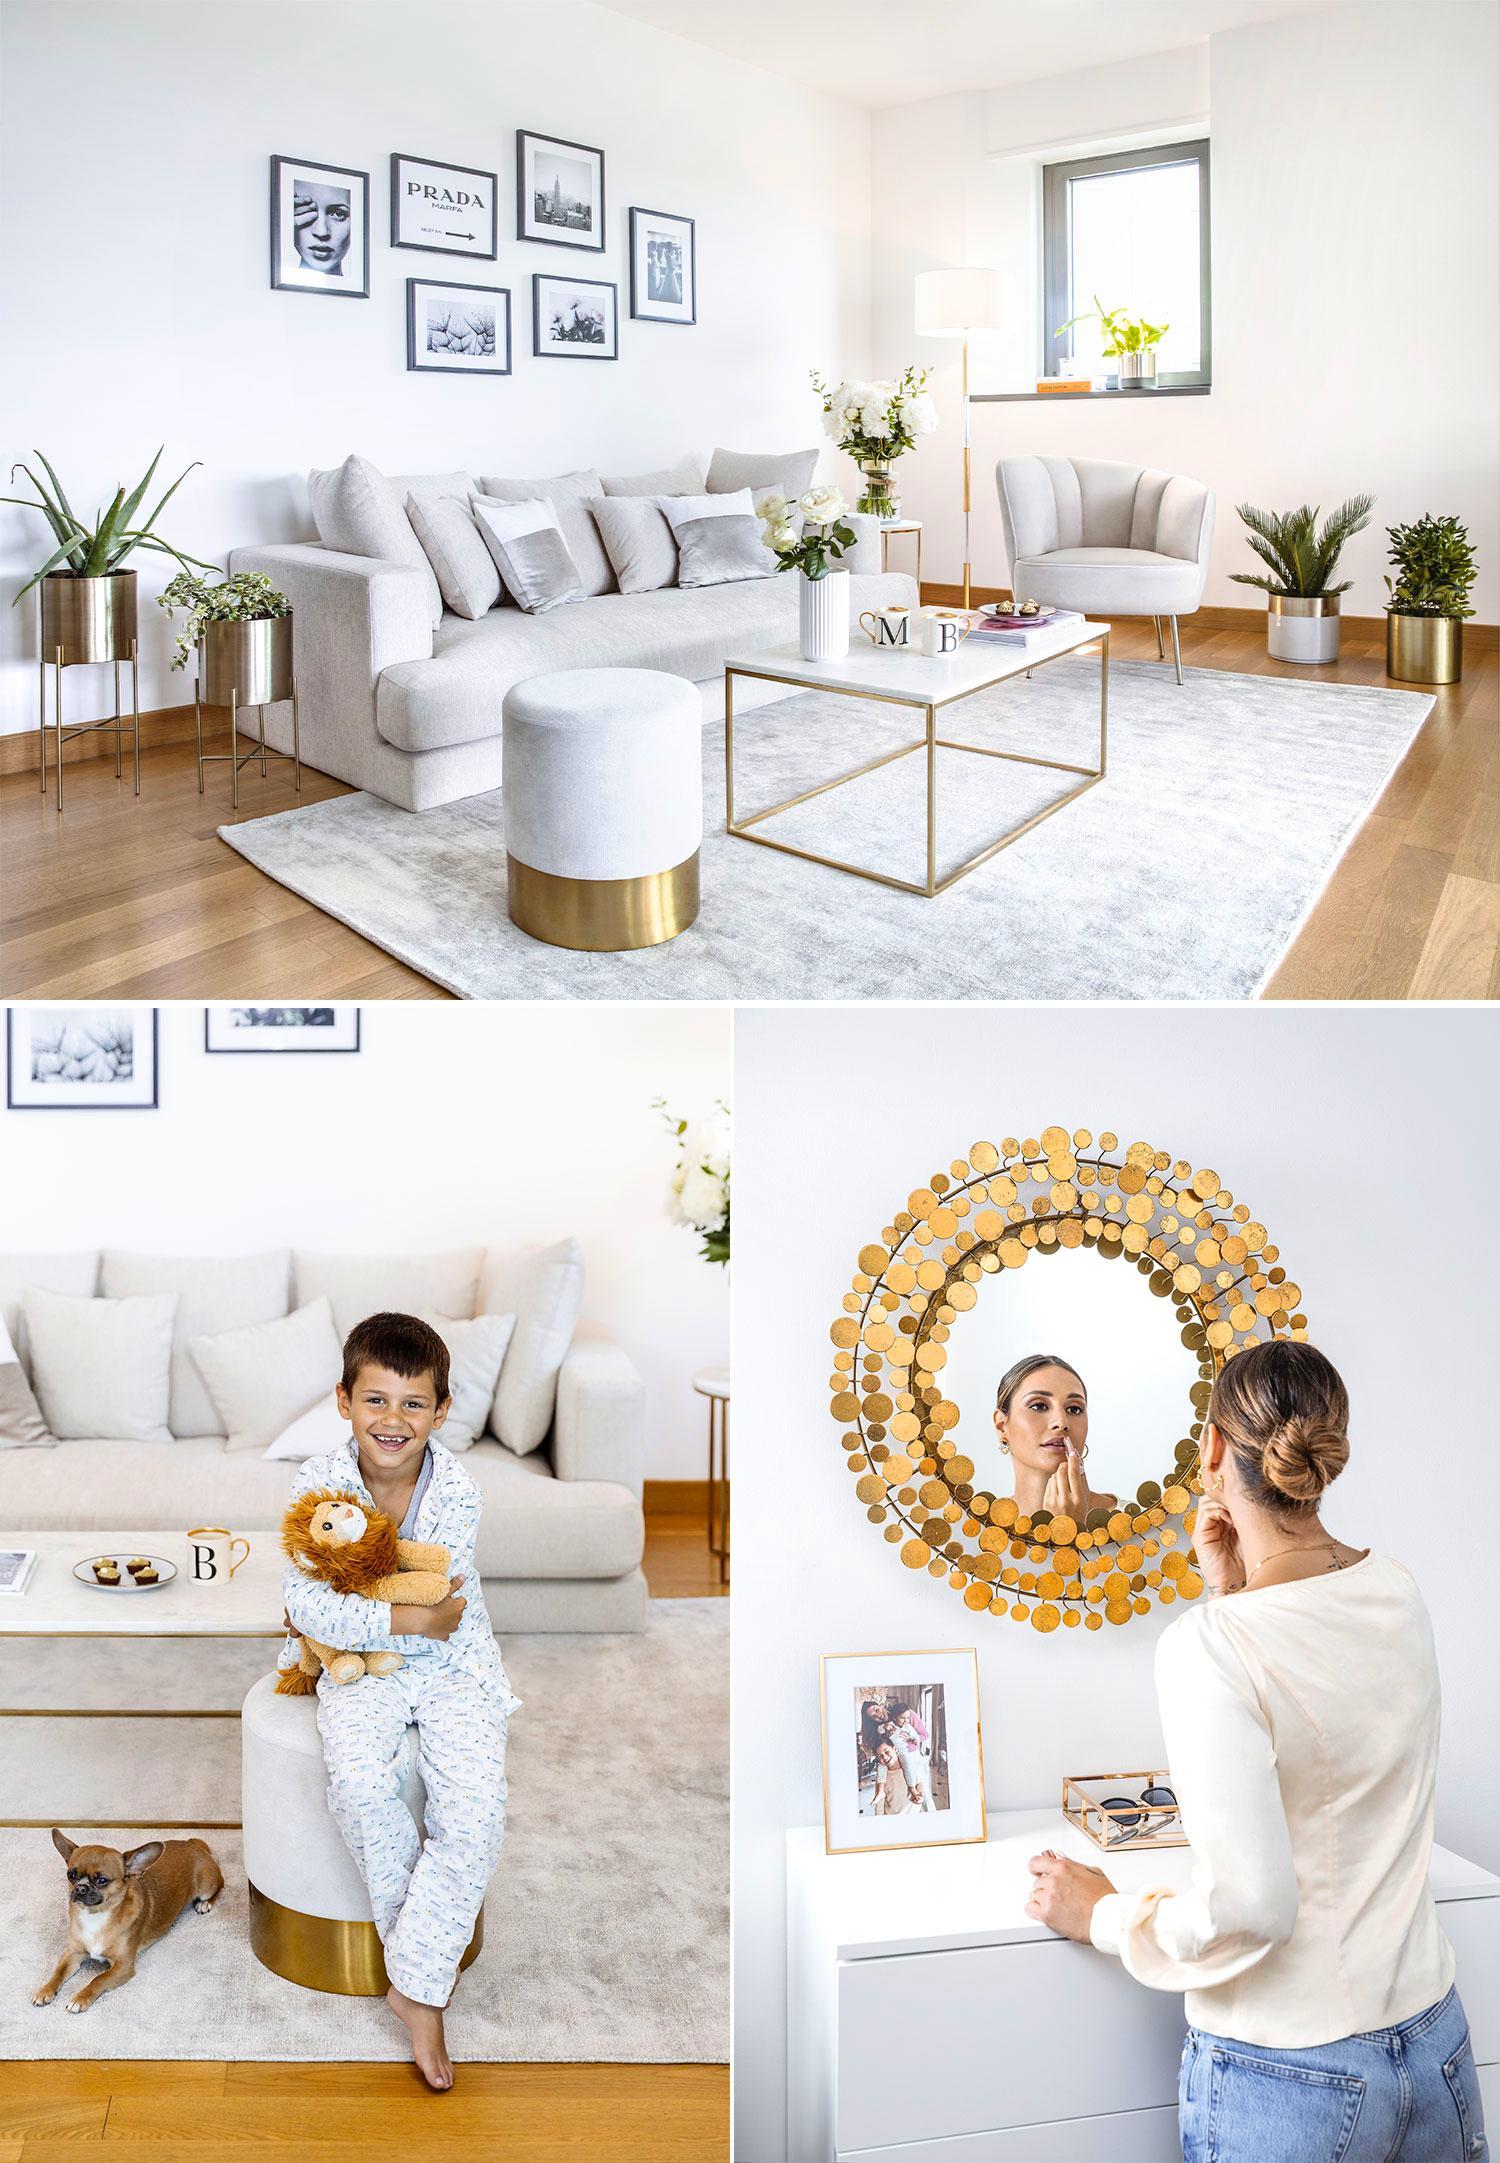 Beatrice Valli, Casa, Tv, Instagram. Uomini e Donne, Stile